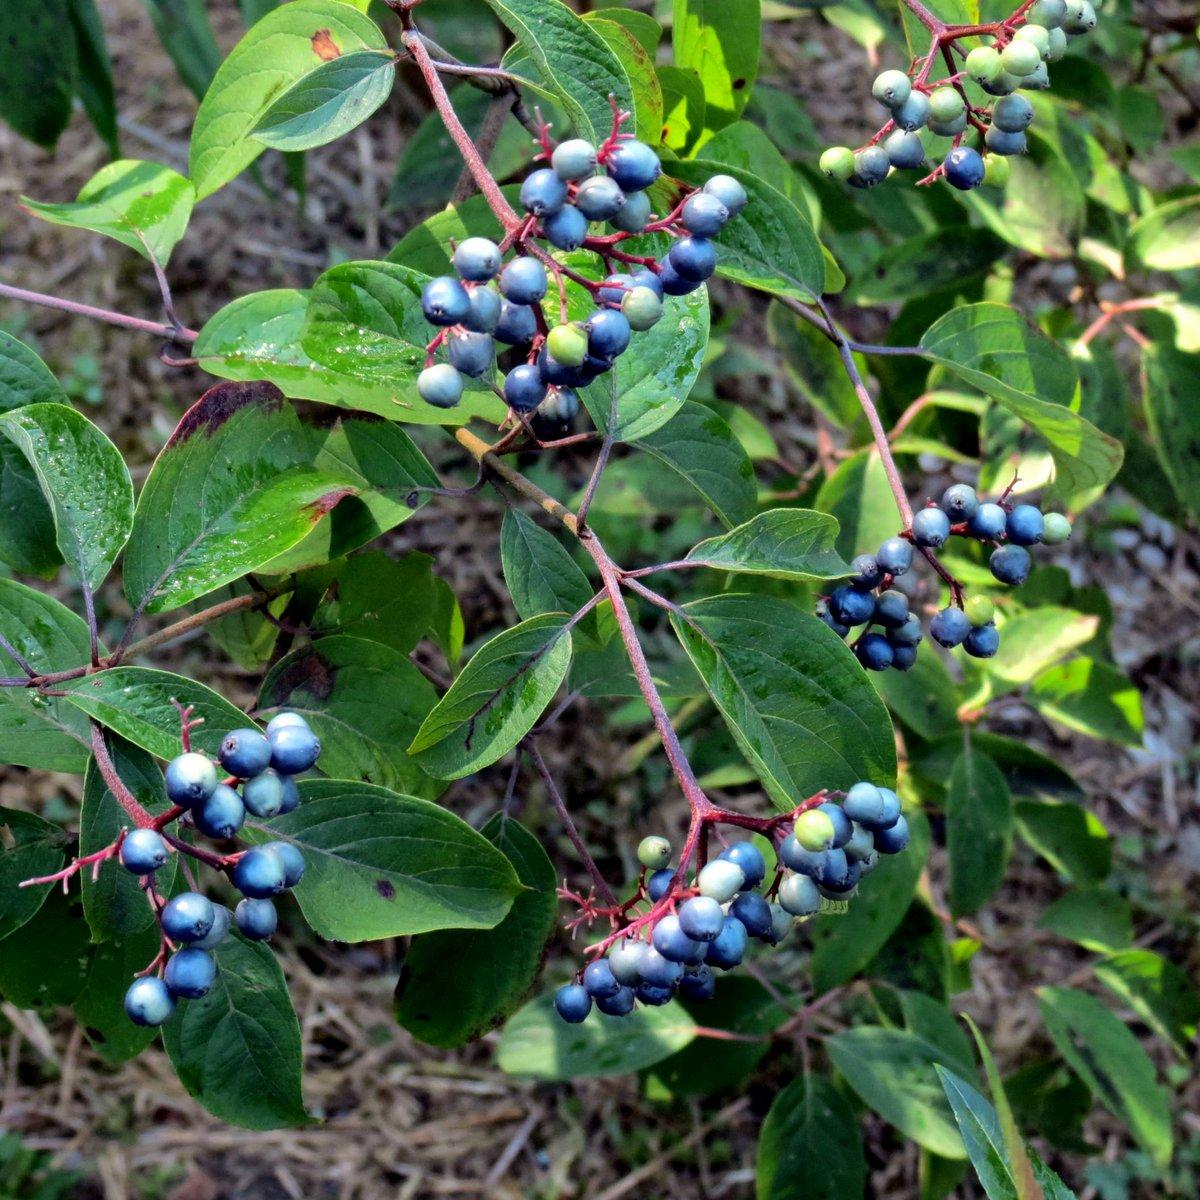 22. Silky Dogwood Berries